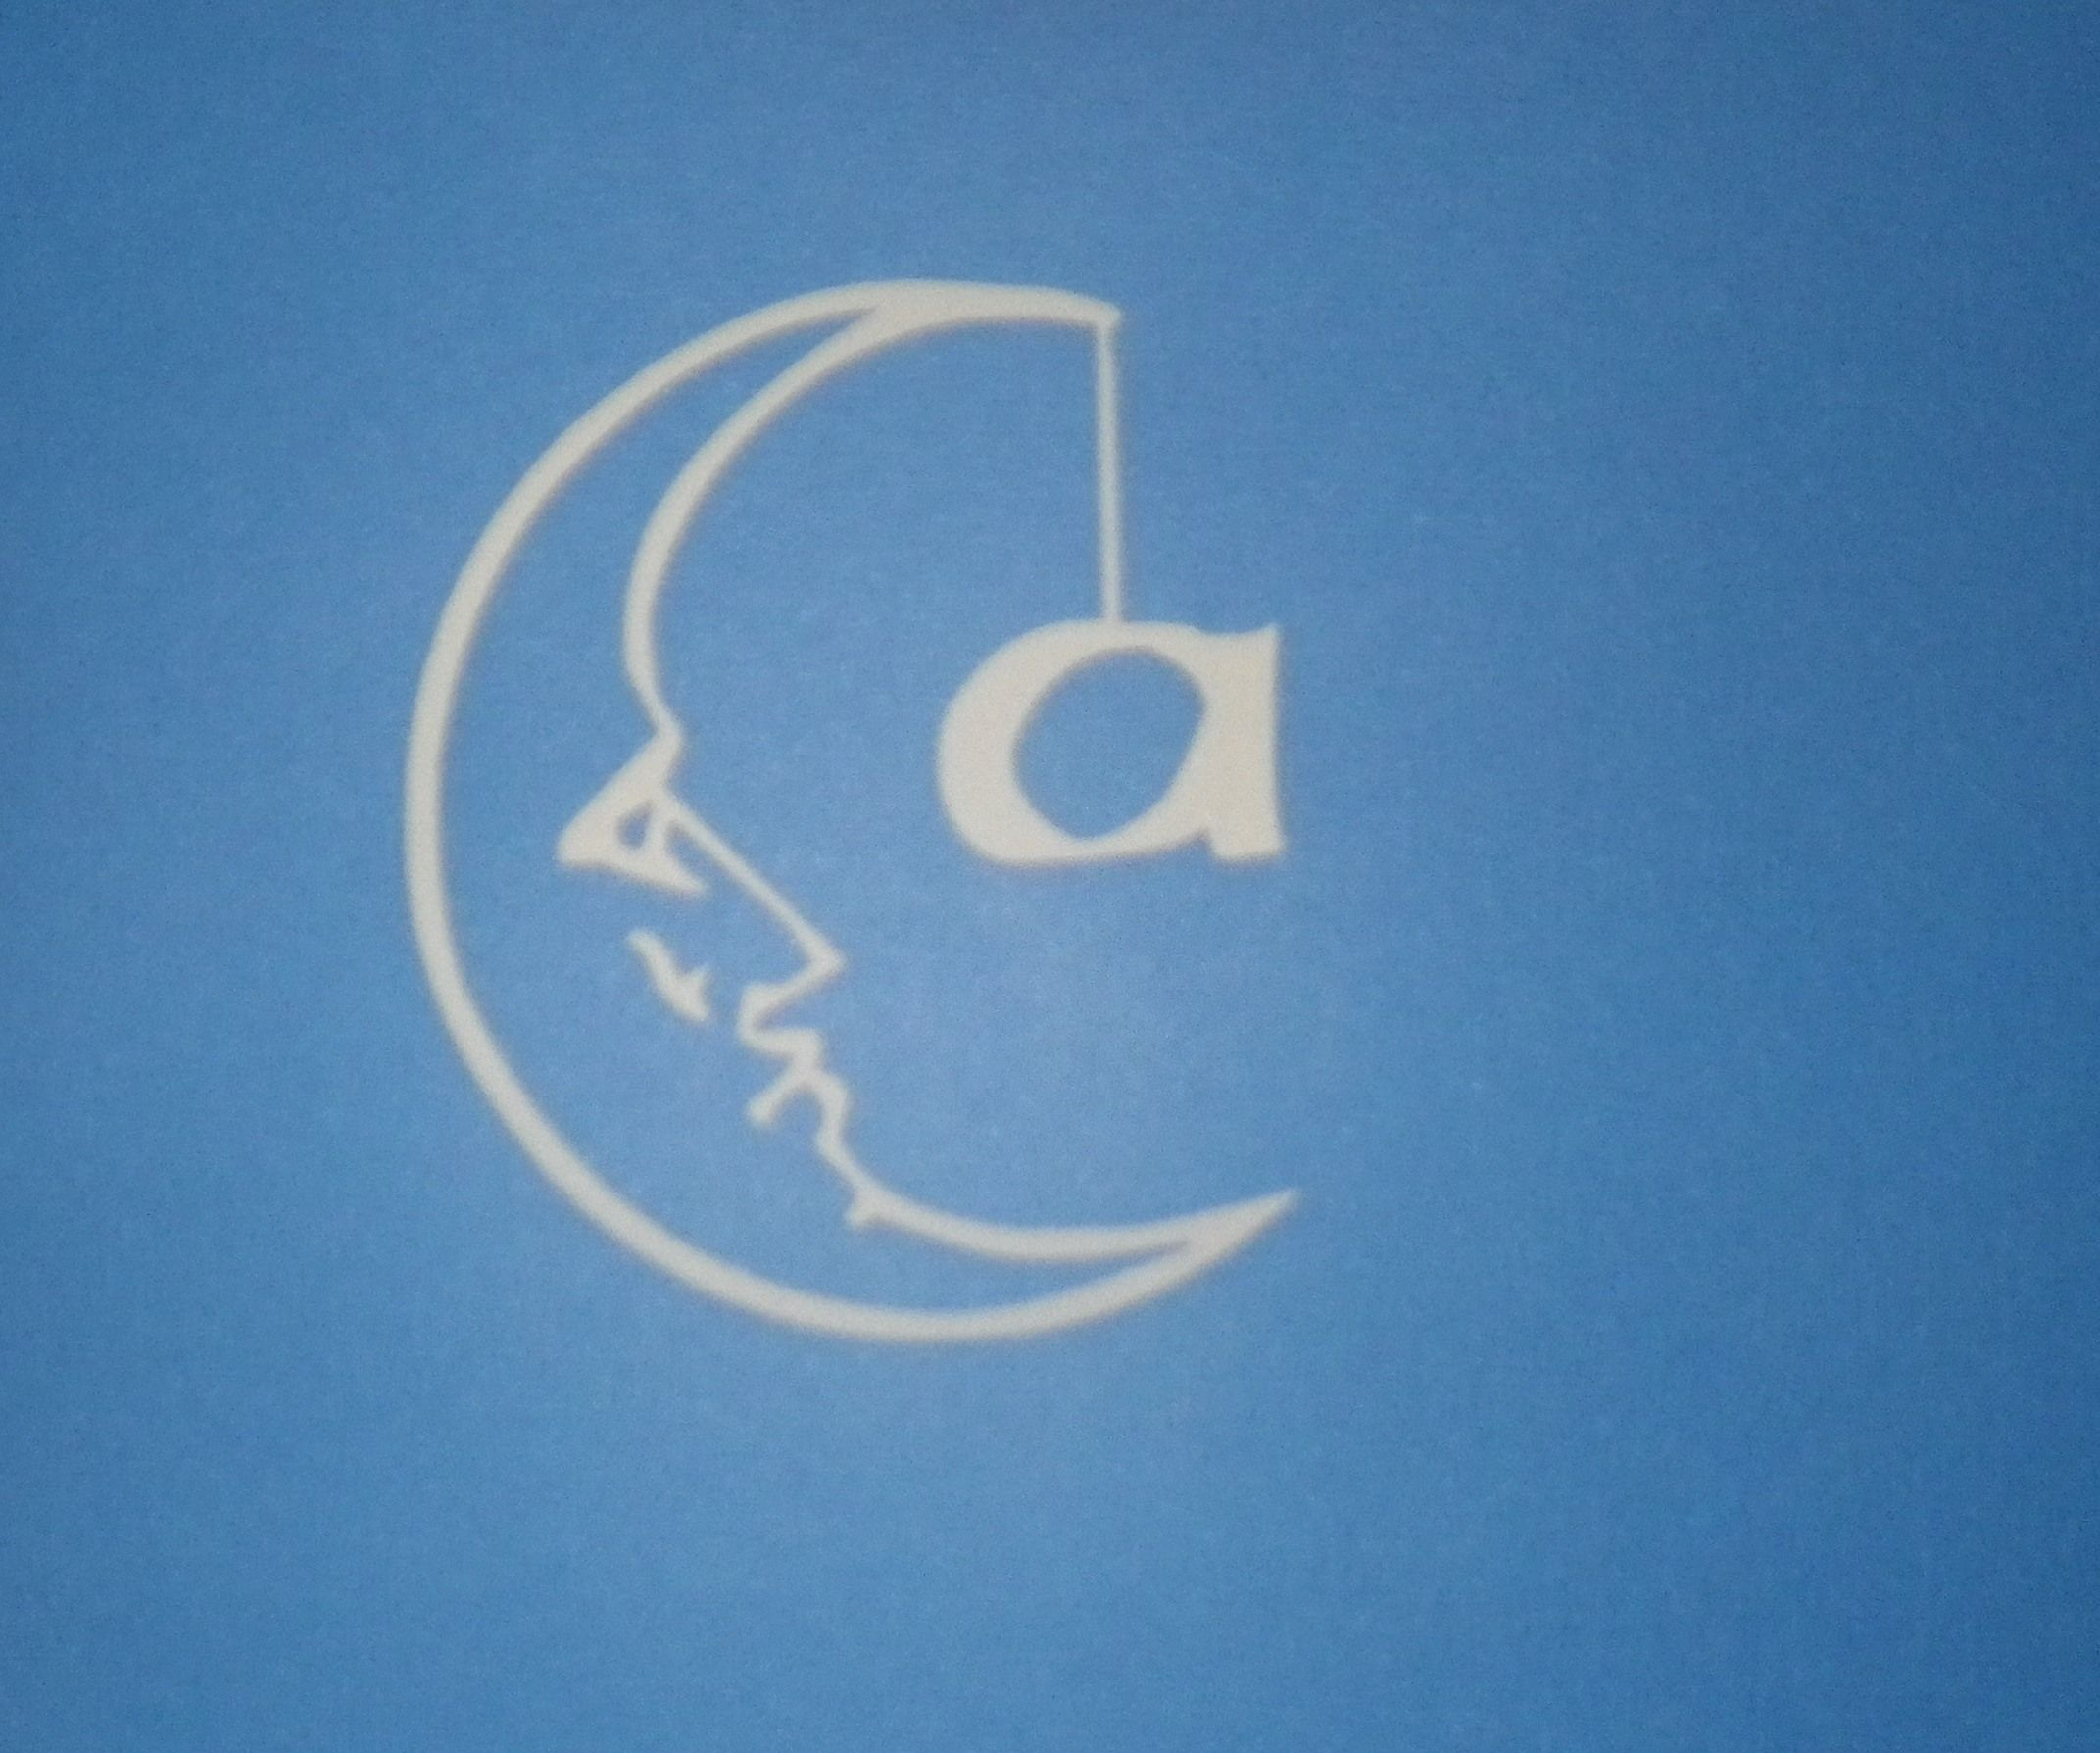 Neon signs tech company logos